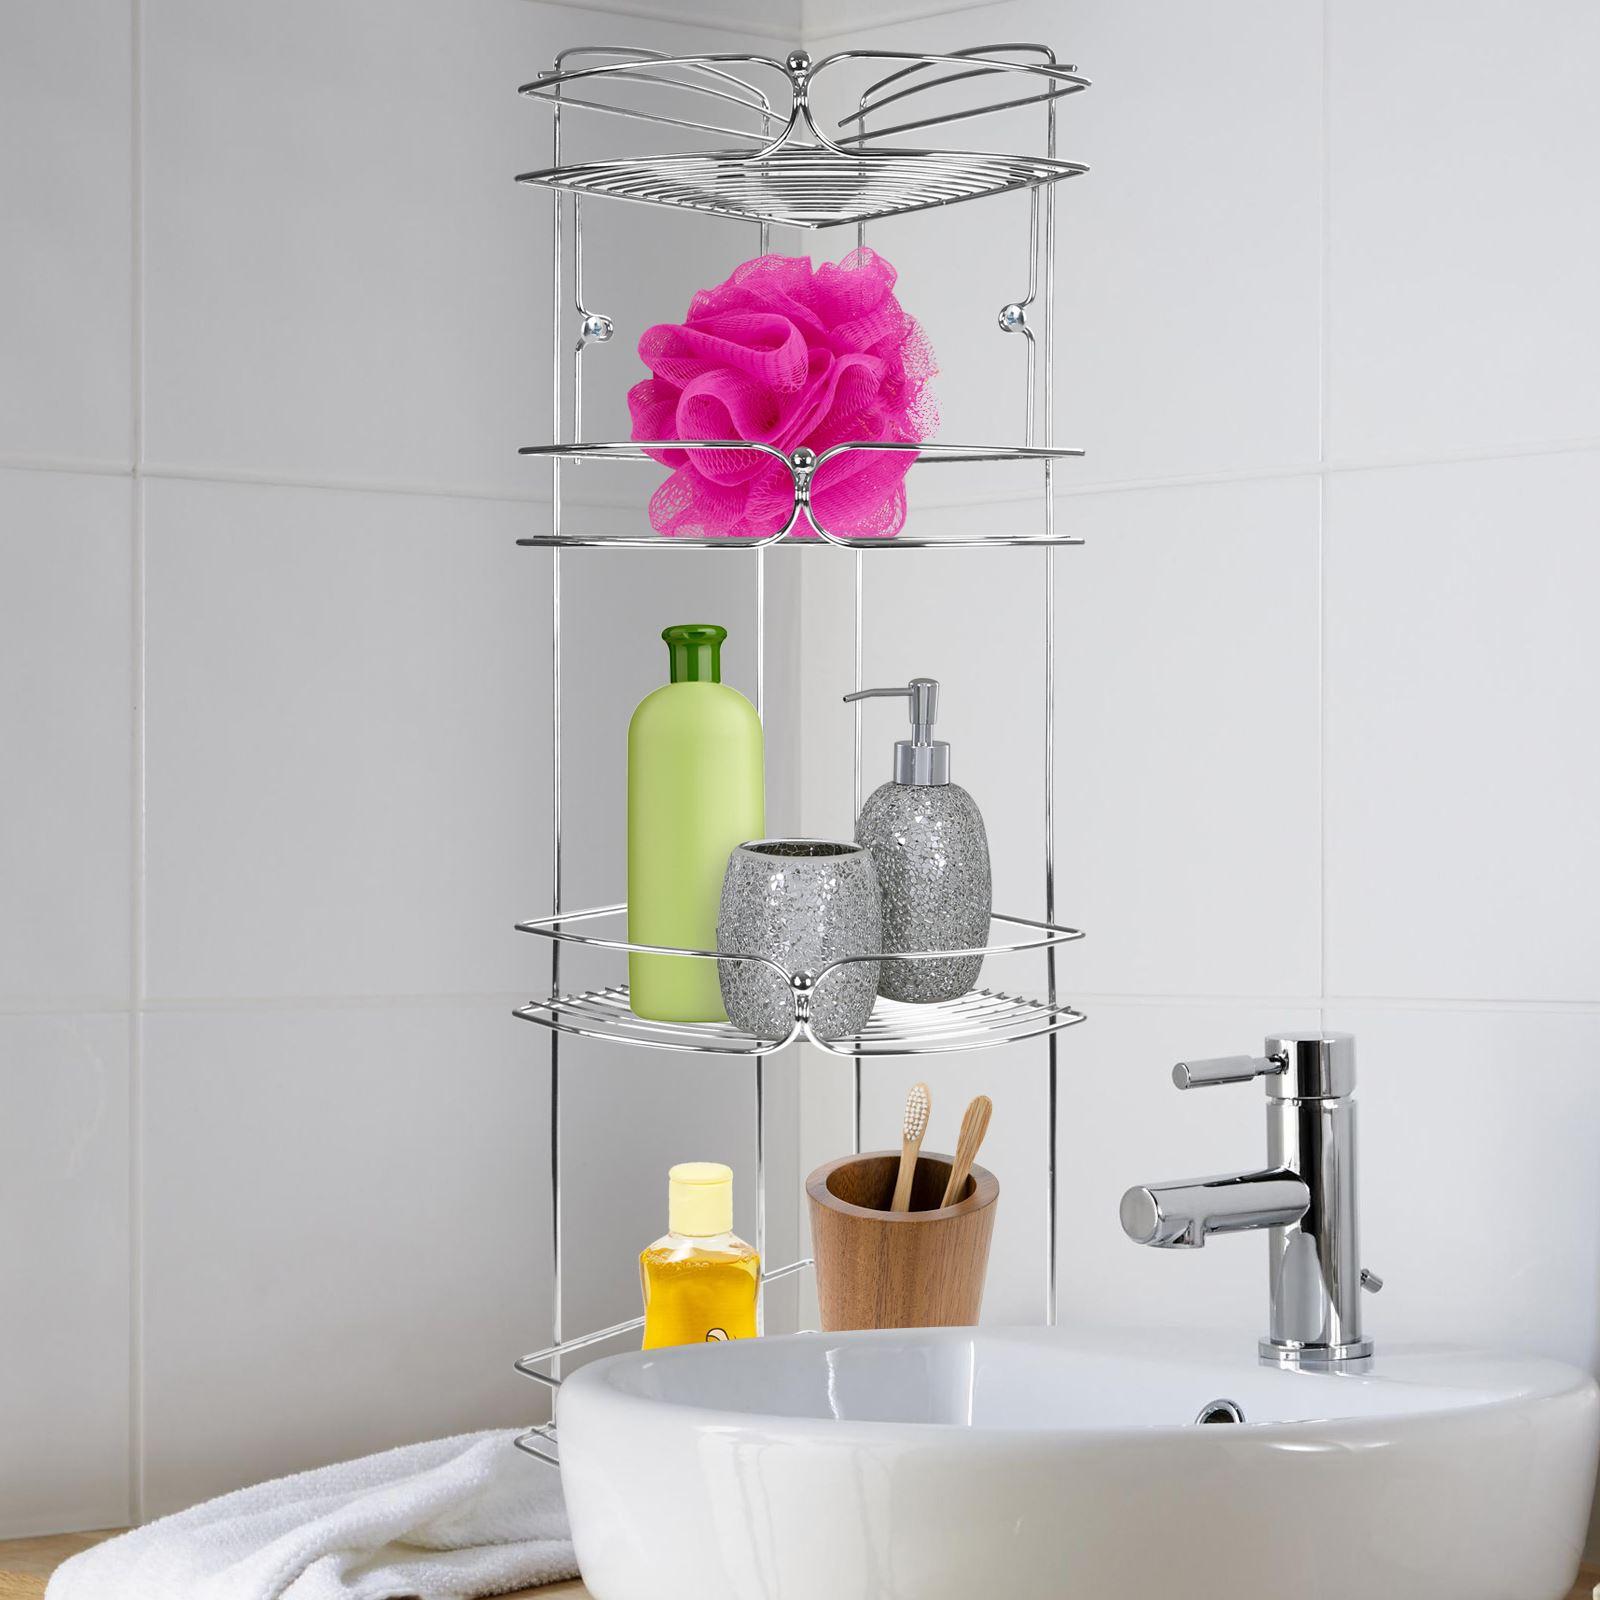 Chrome-Bathroom-Accessory-Shower-Caddy-Corner-Rack-Storage-Trolley-Roll-Holder thumbnail 9